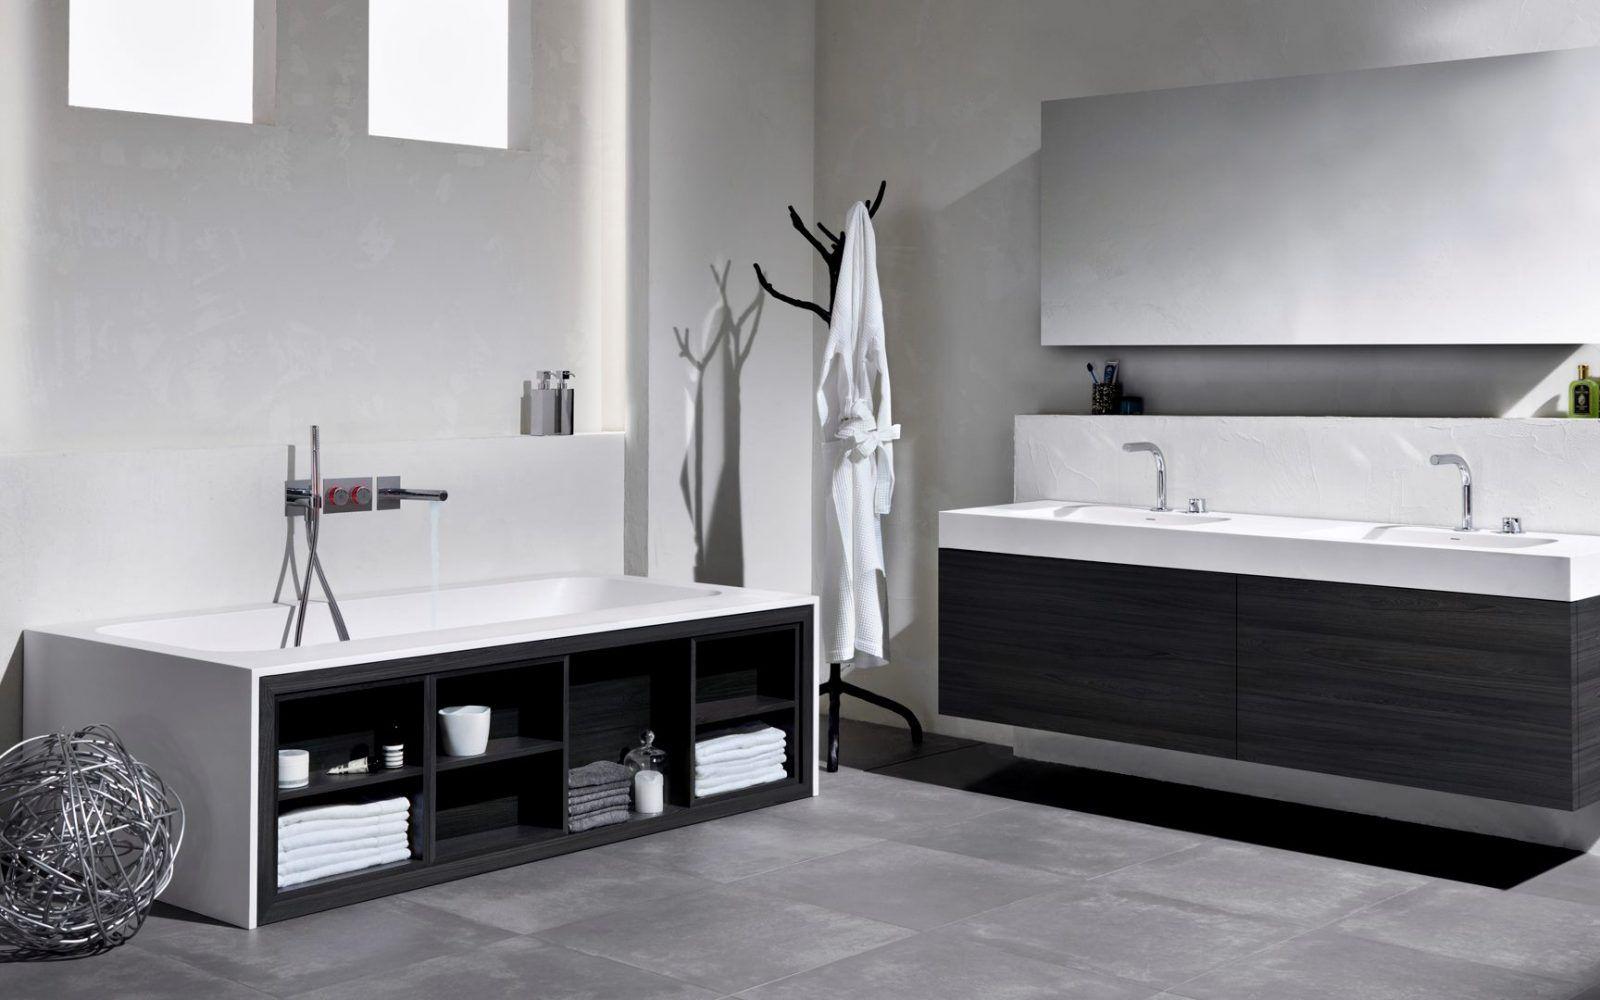 RM Living Cincinnati Contemporary Bathroom Design By Blu Bathworks